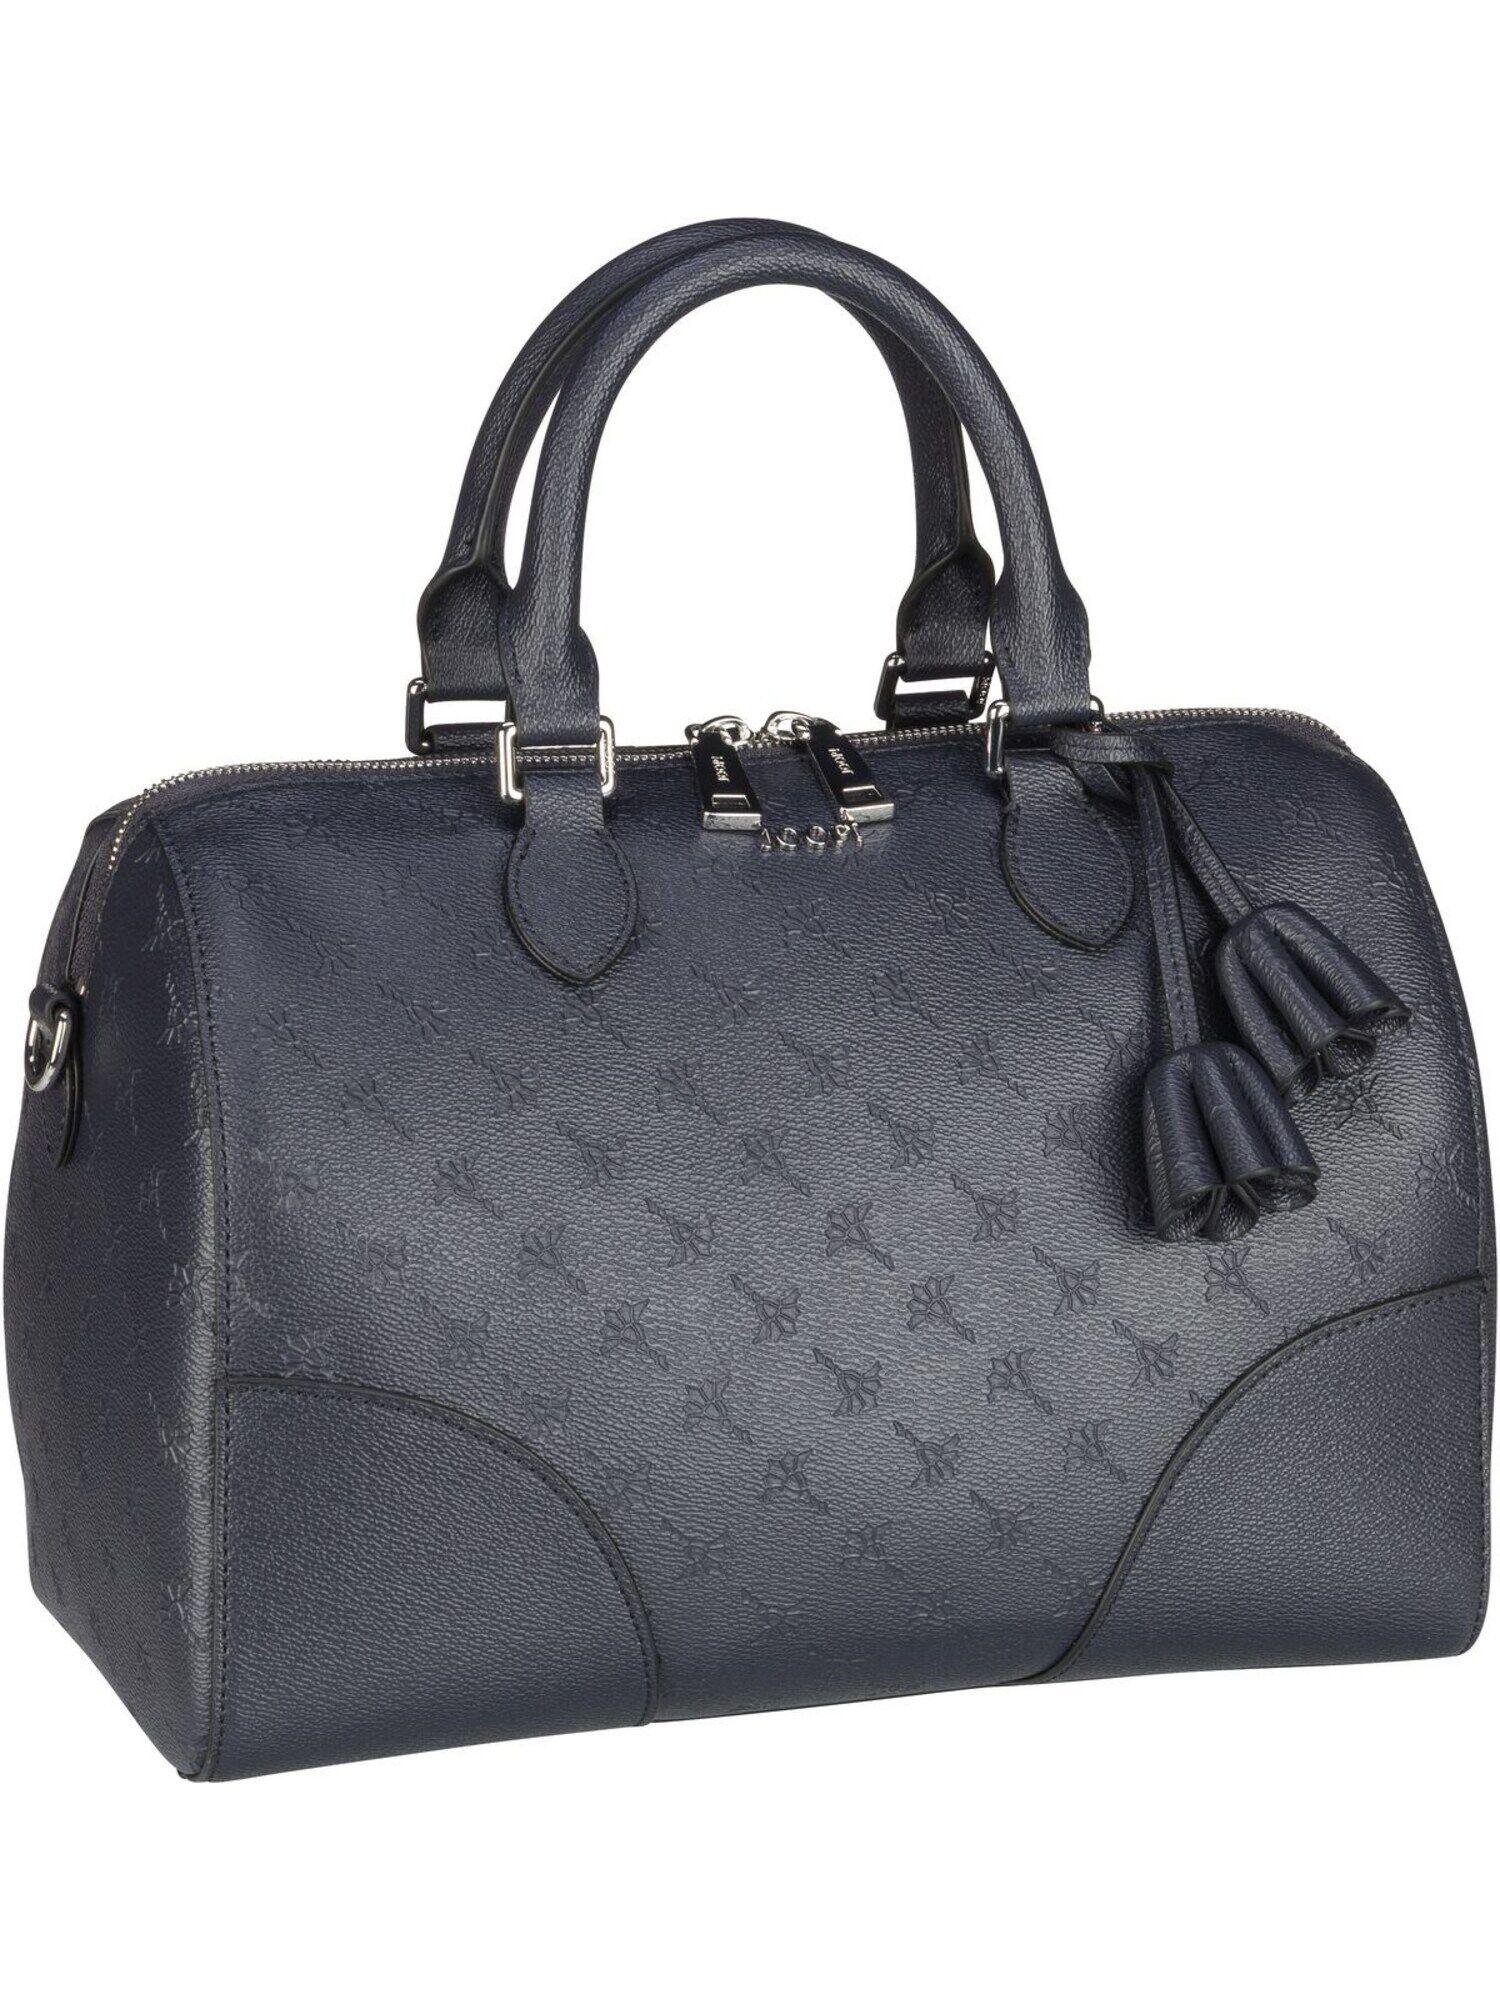 JOOP! Sacs à main ' Cortina Stampa Aurora Handbag SHZ '  - Bleu - Taille: One Size - female